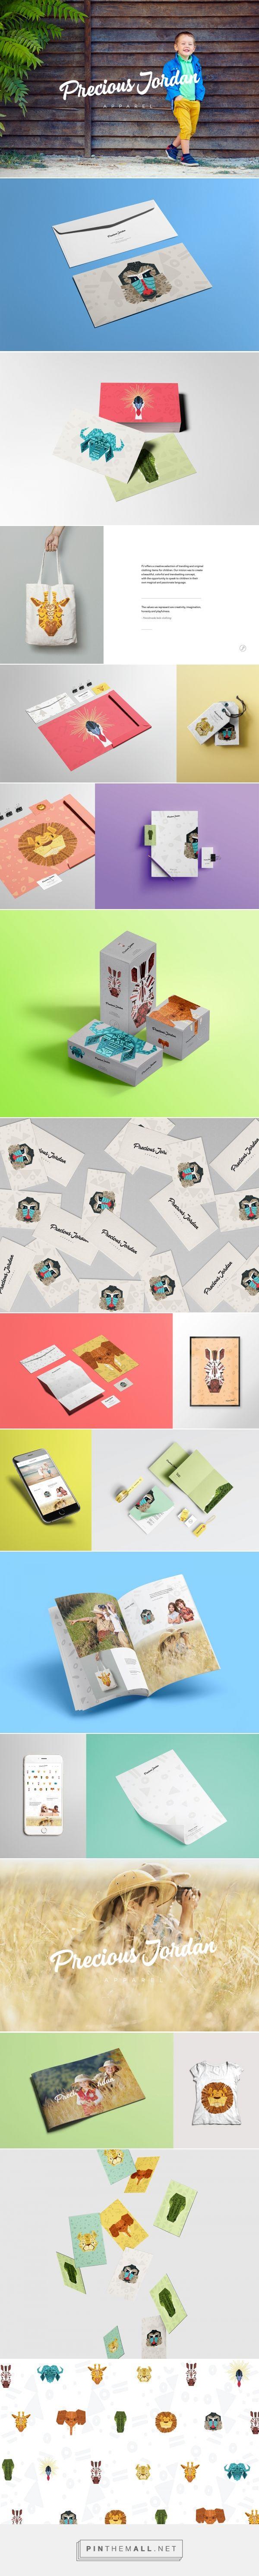 Precious Jordan Apparel Branding on Behance | Fivestar Branding – Design and Branding Agency & Inspiration Gallery